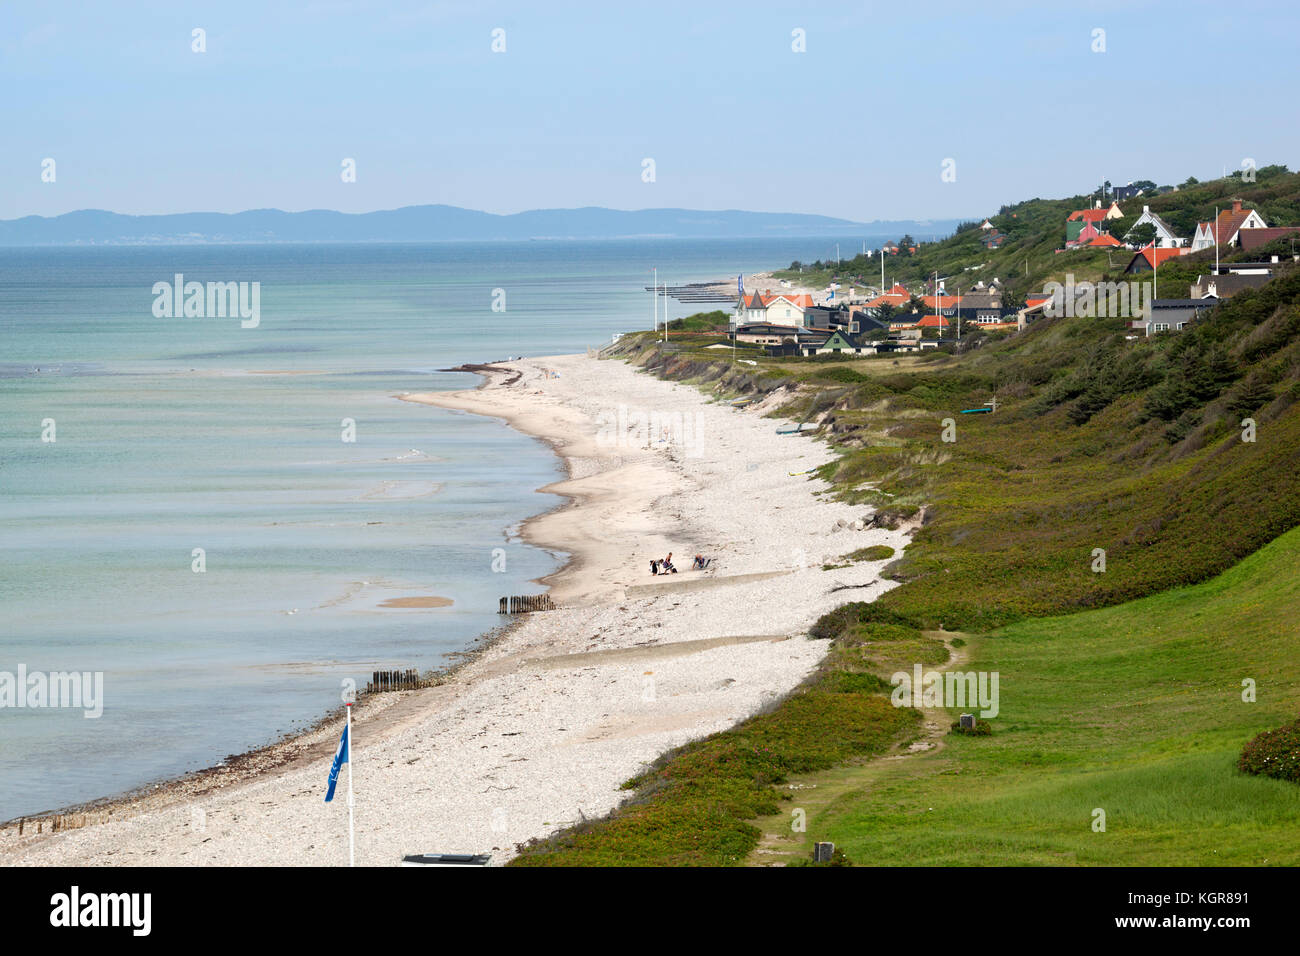 View over Rageleje Strand beach with Swedish coastline in distance, Rageleje, Kattegat Coast, Zealand, Denmark, - Stock Image